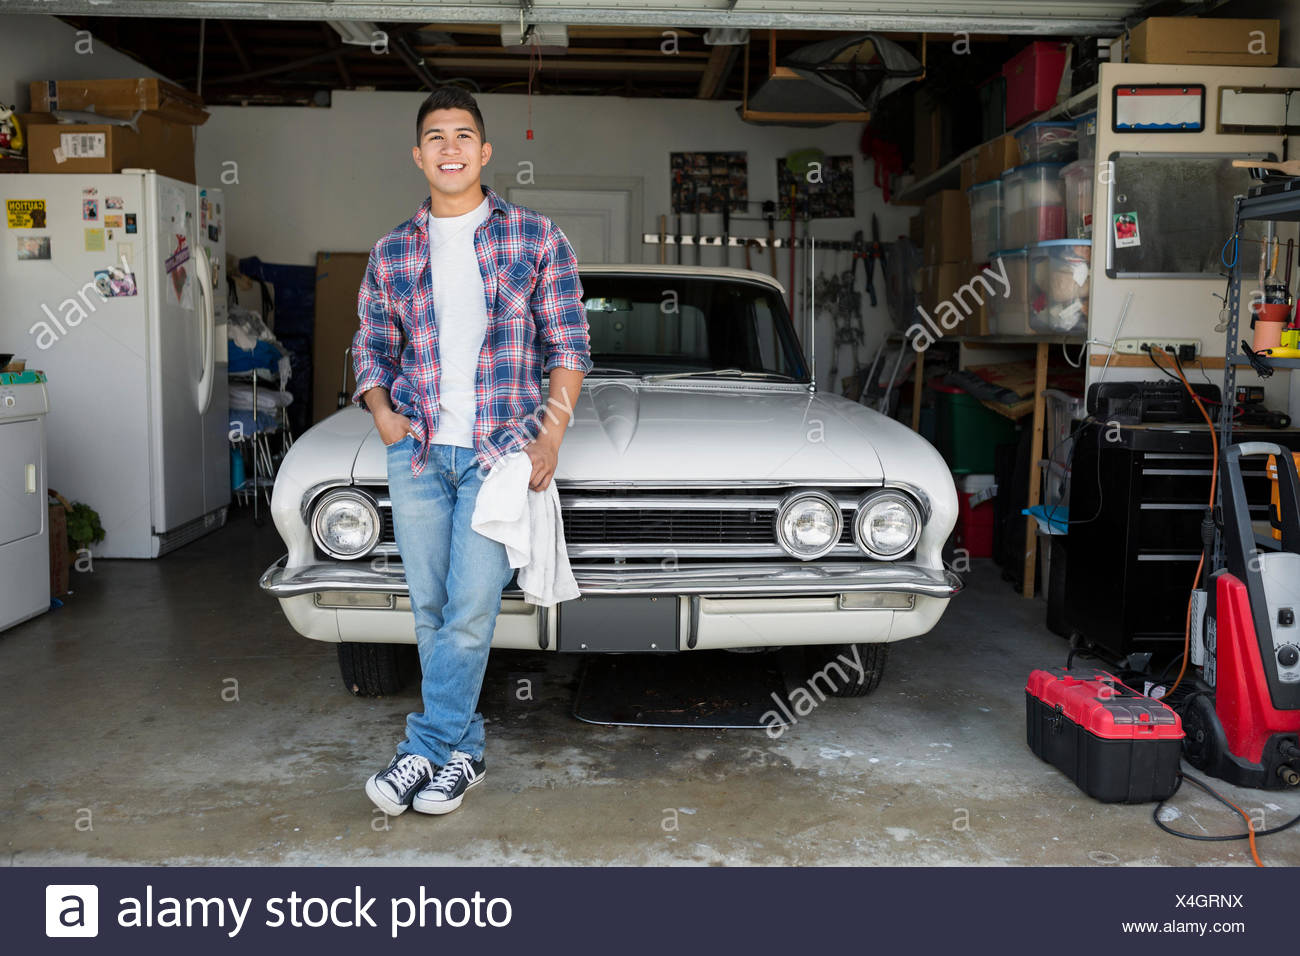 Garage im genes de stock garage fotos de stock alamy - Garaje de coches ...